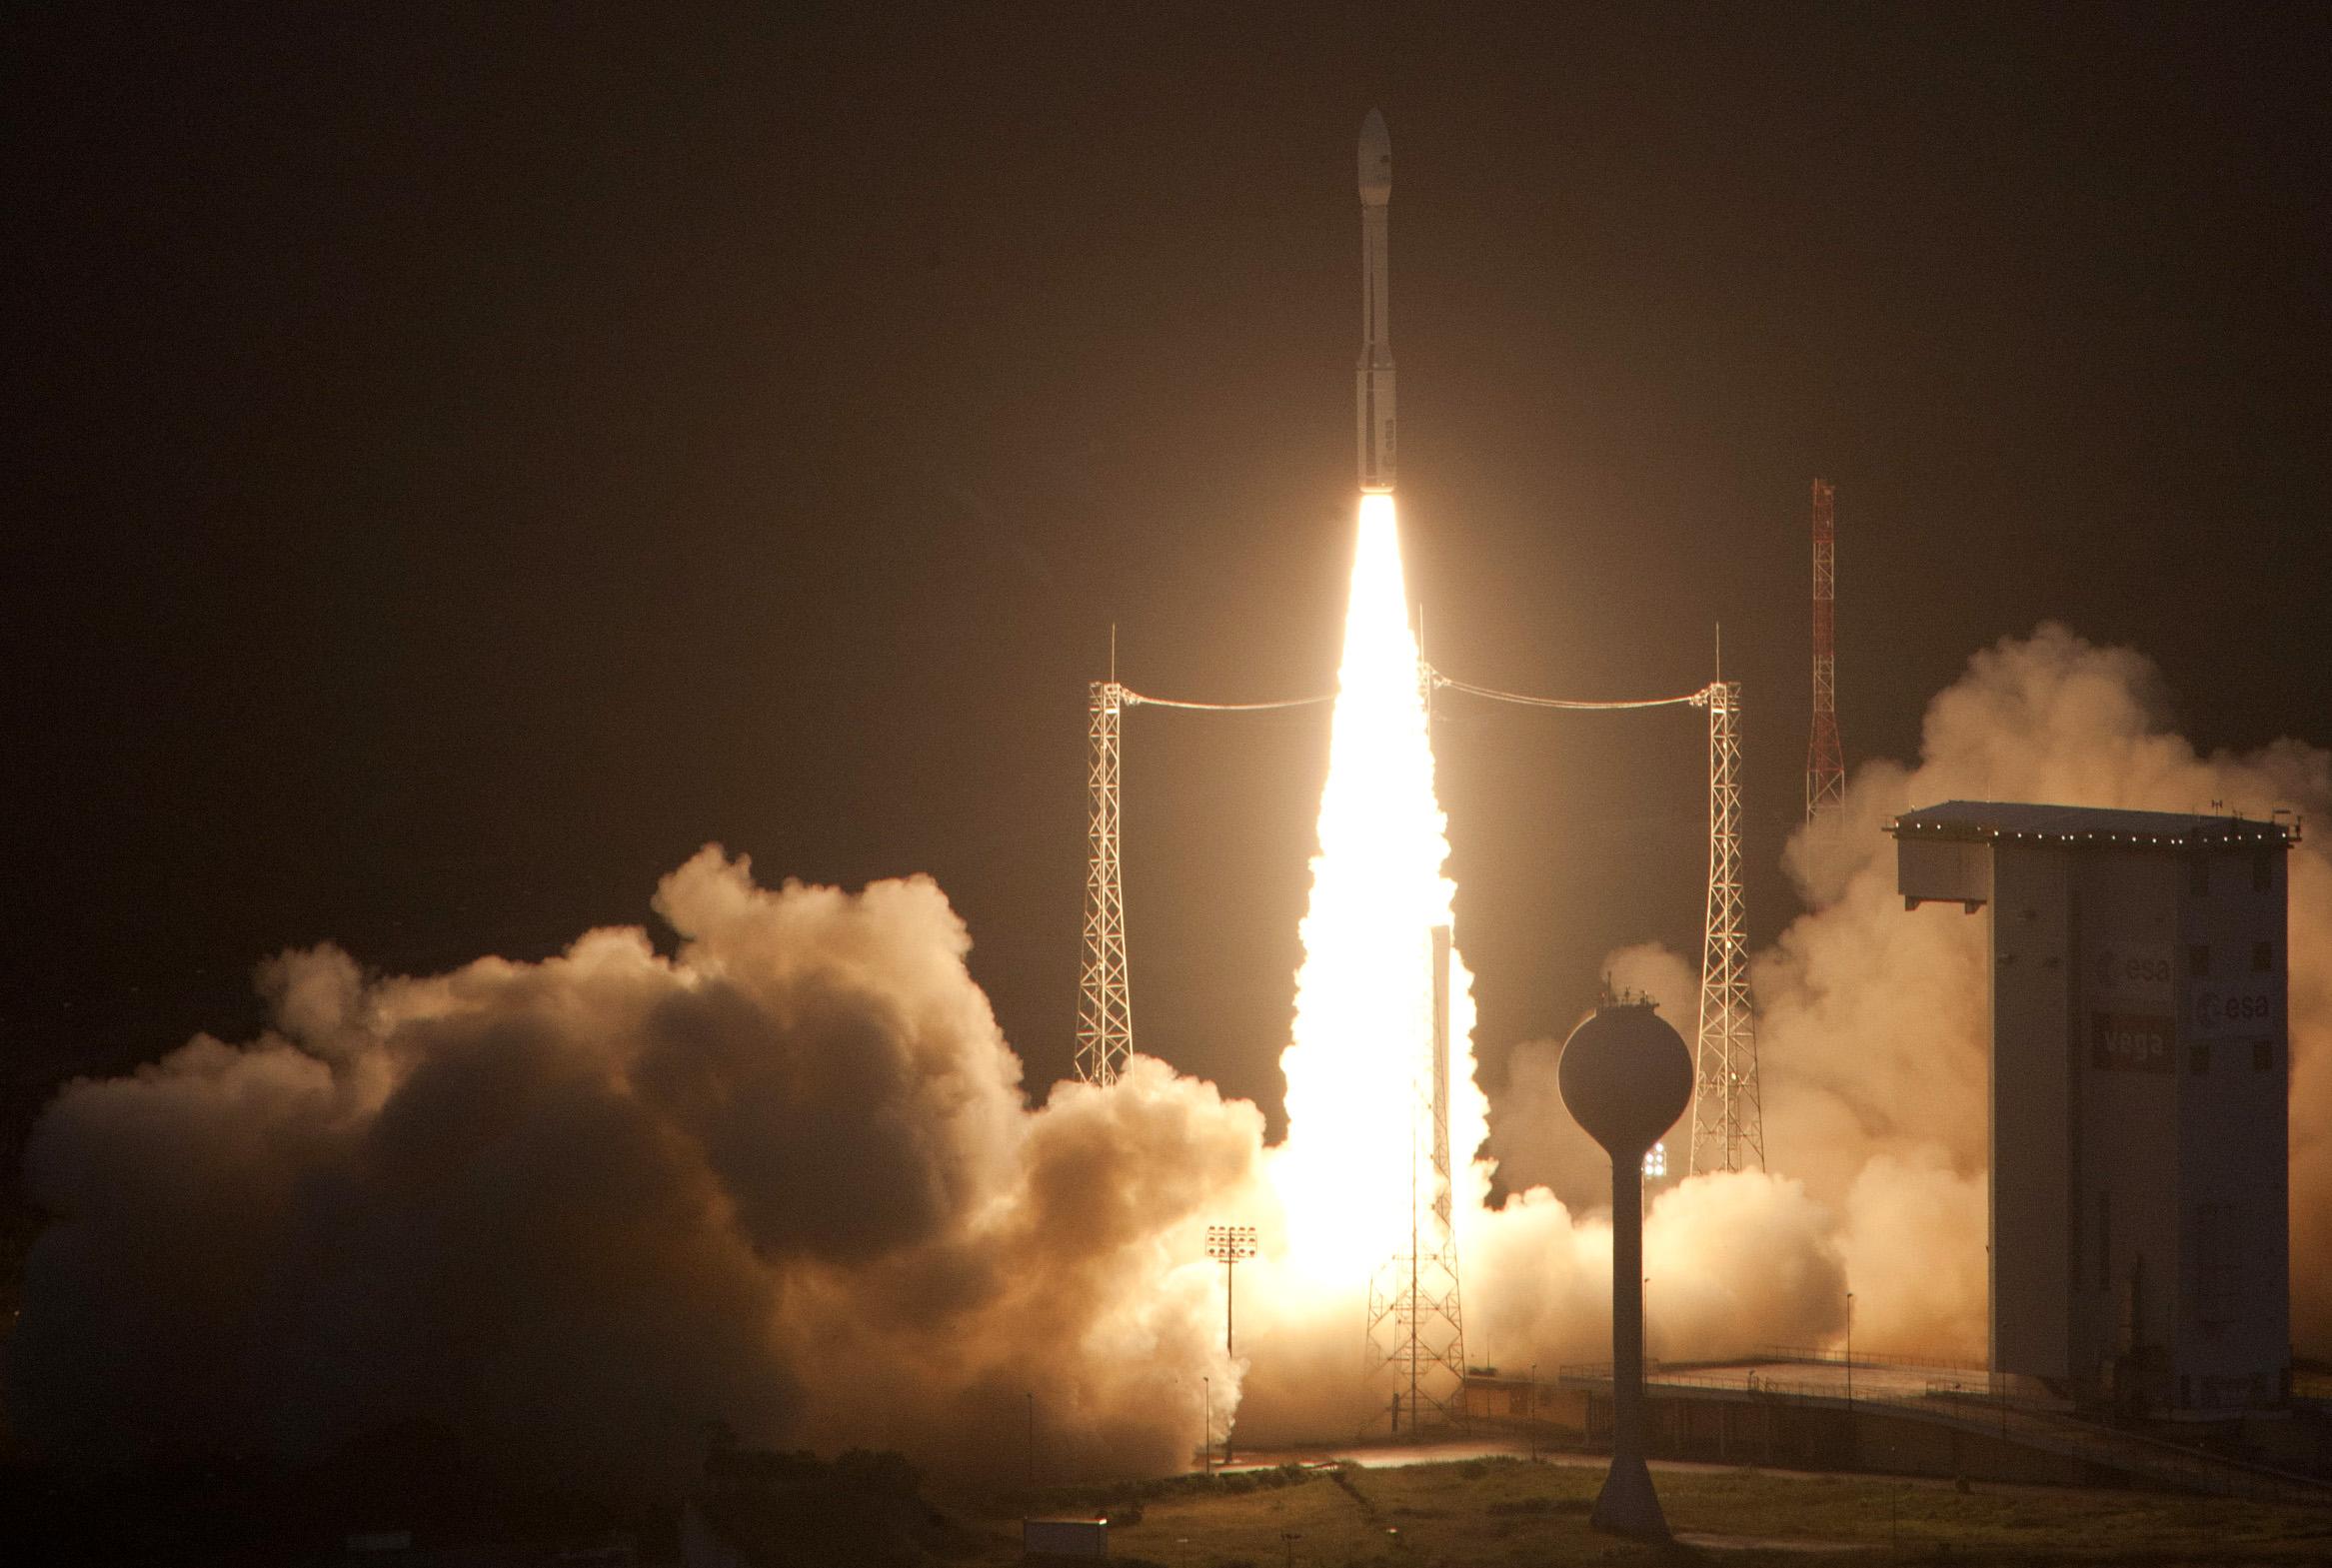 Europe Launches New Vega Rocket on Maiden Voyage